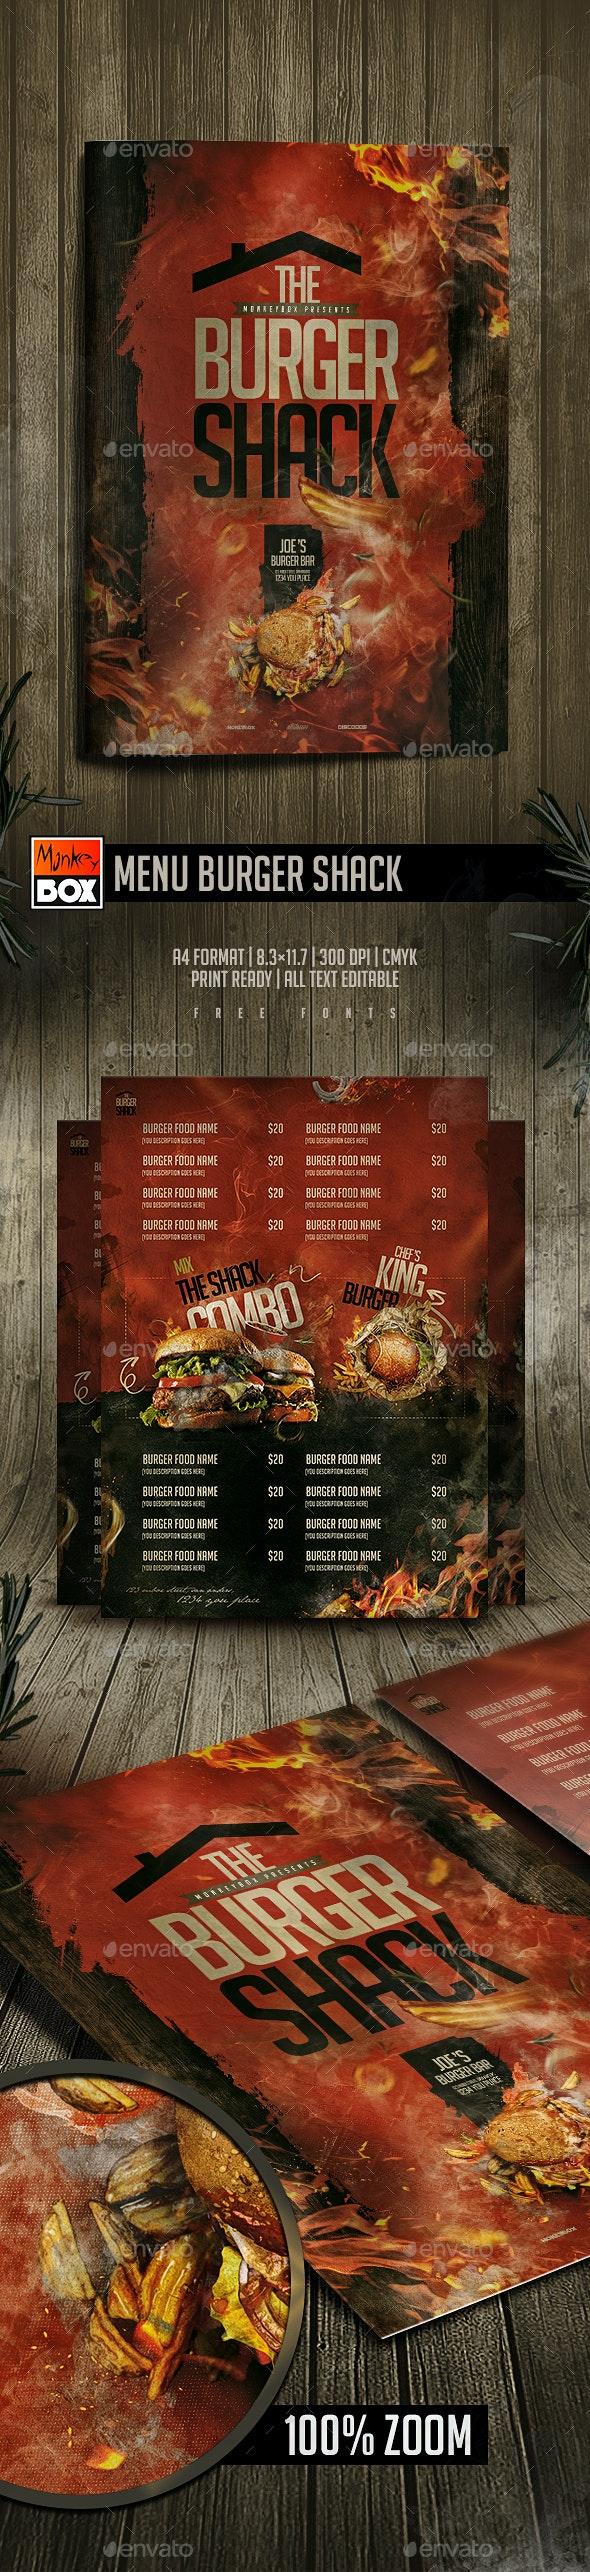 Menu Burger Shack - Food Menus Print Templates